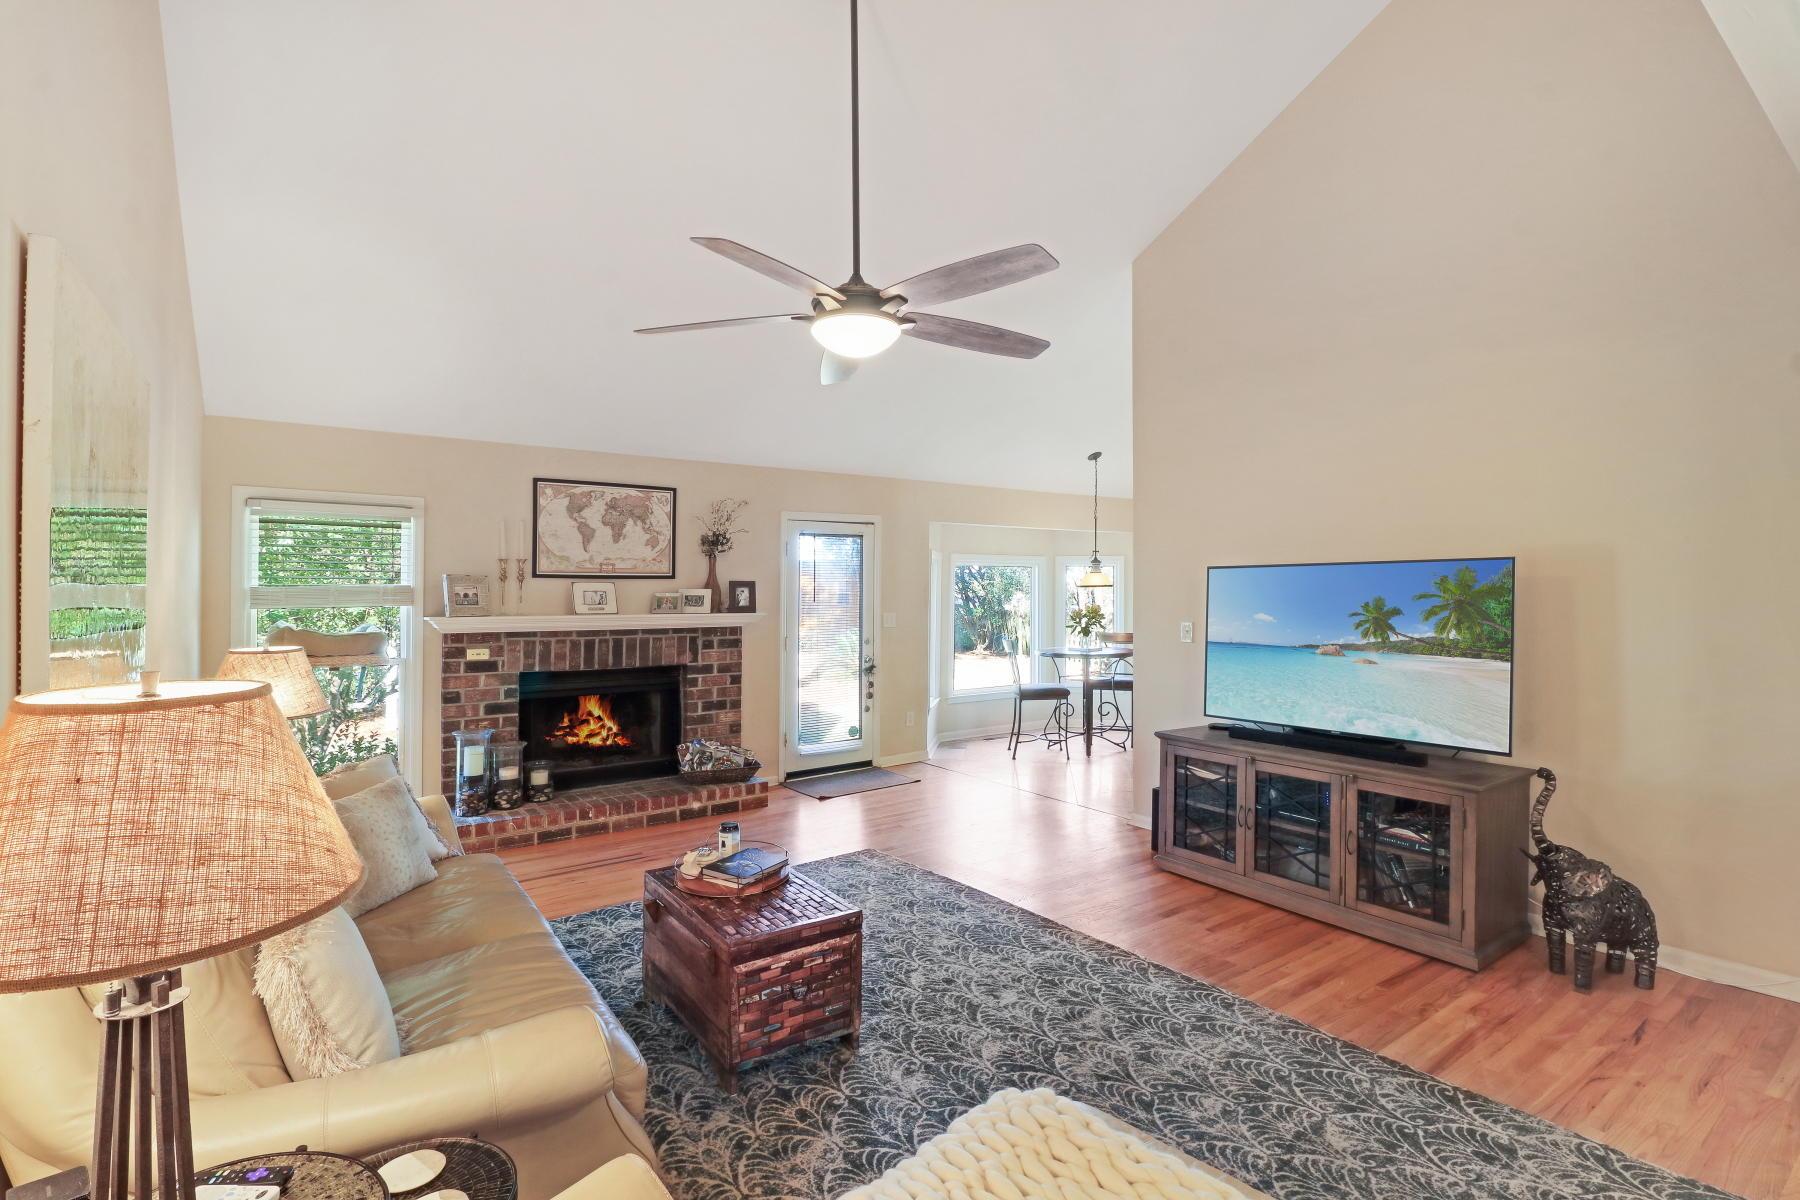 Harrison Acres Homes For Sale - 51 Markfield, Charleston, SC - 6